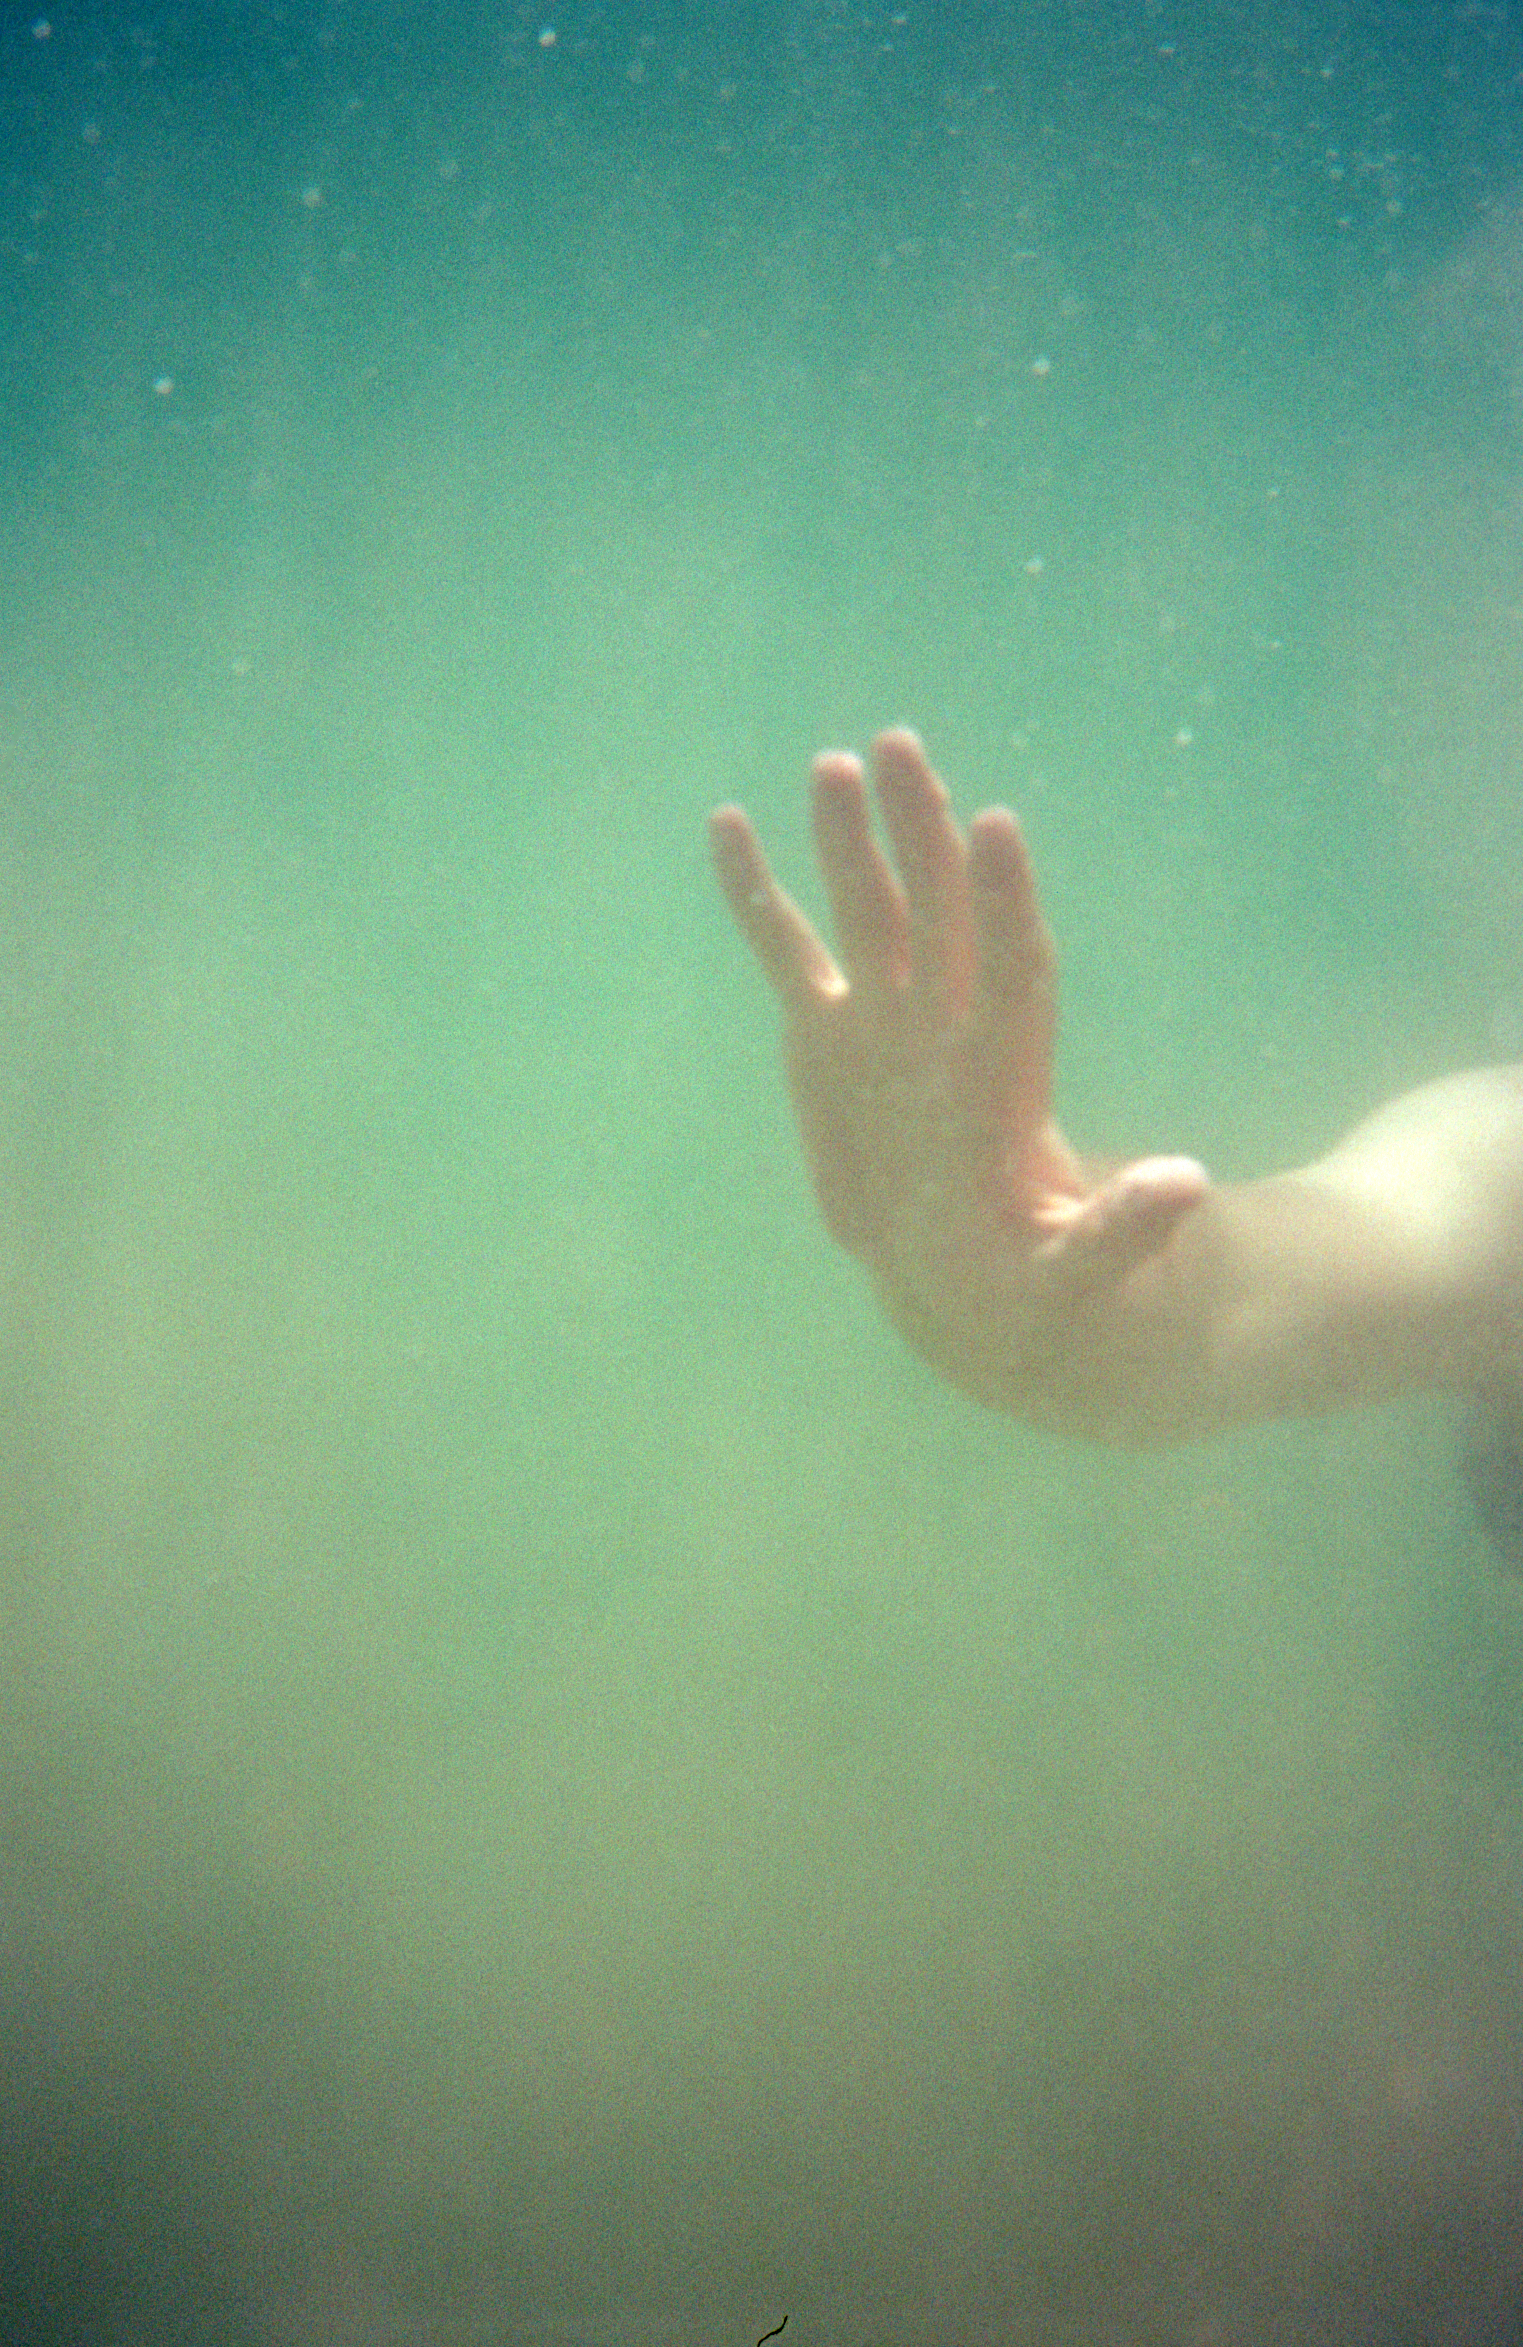 Katt Janson Merilo | Touching the Void | Expired Underwater Disposable